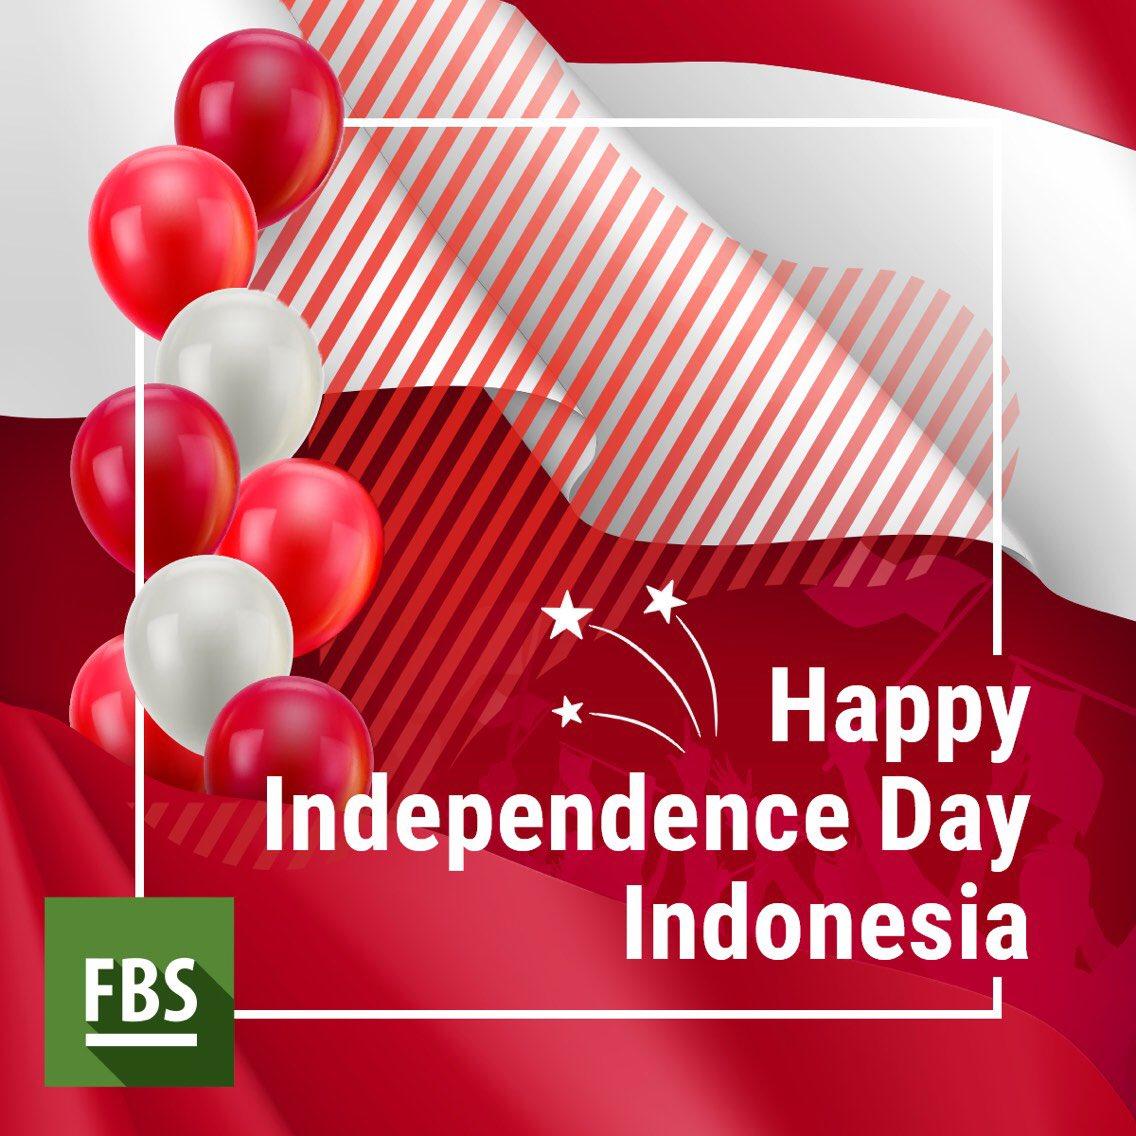 Company FBS (@FBS_news) | Twitter